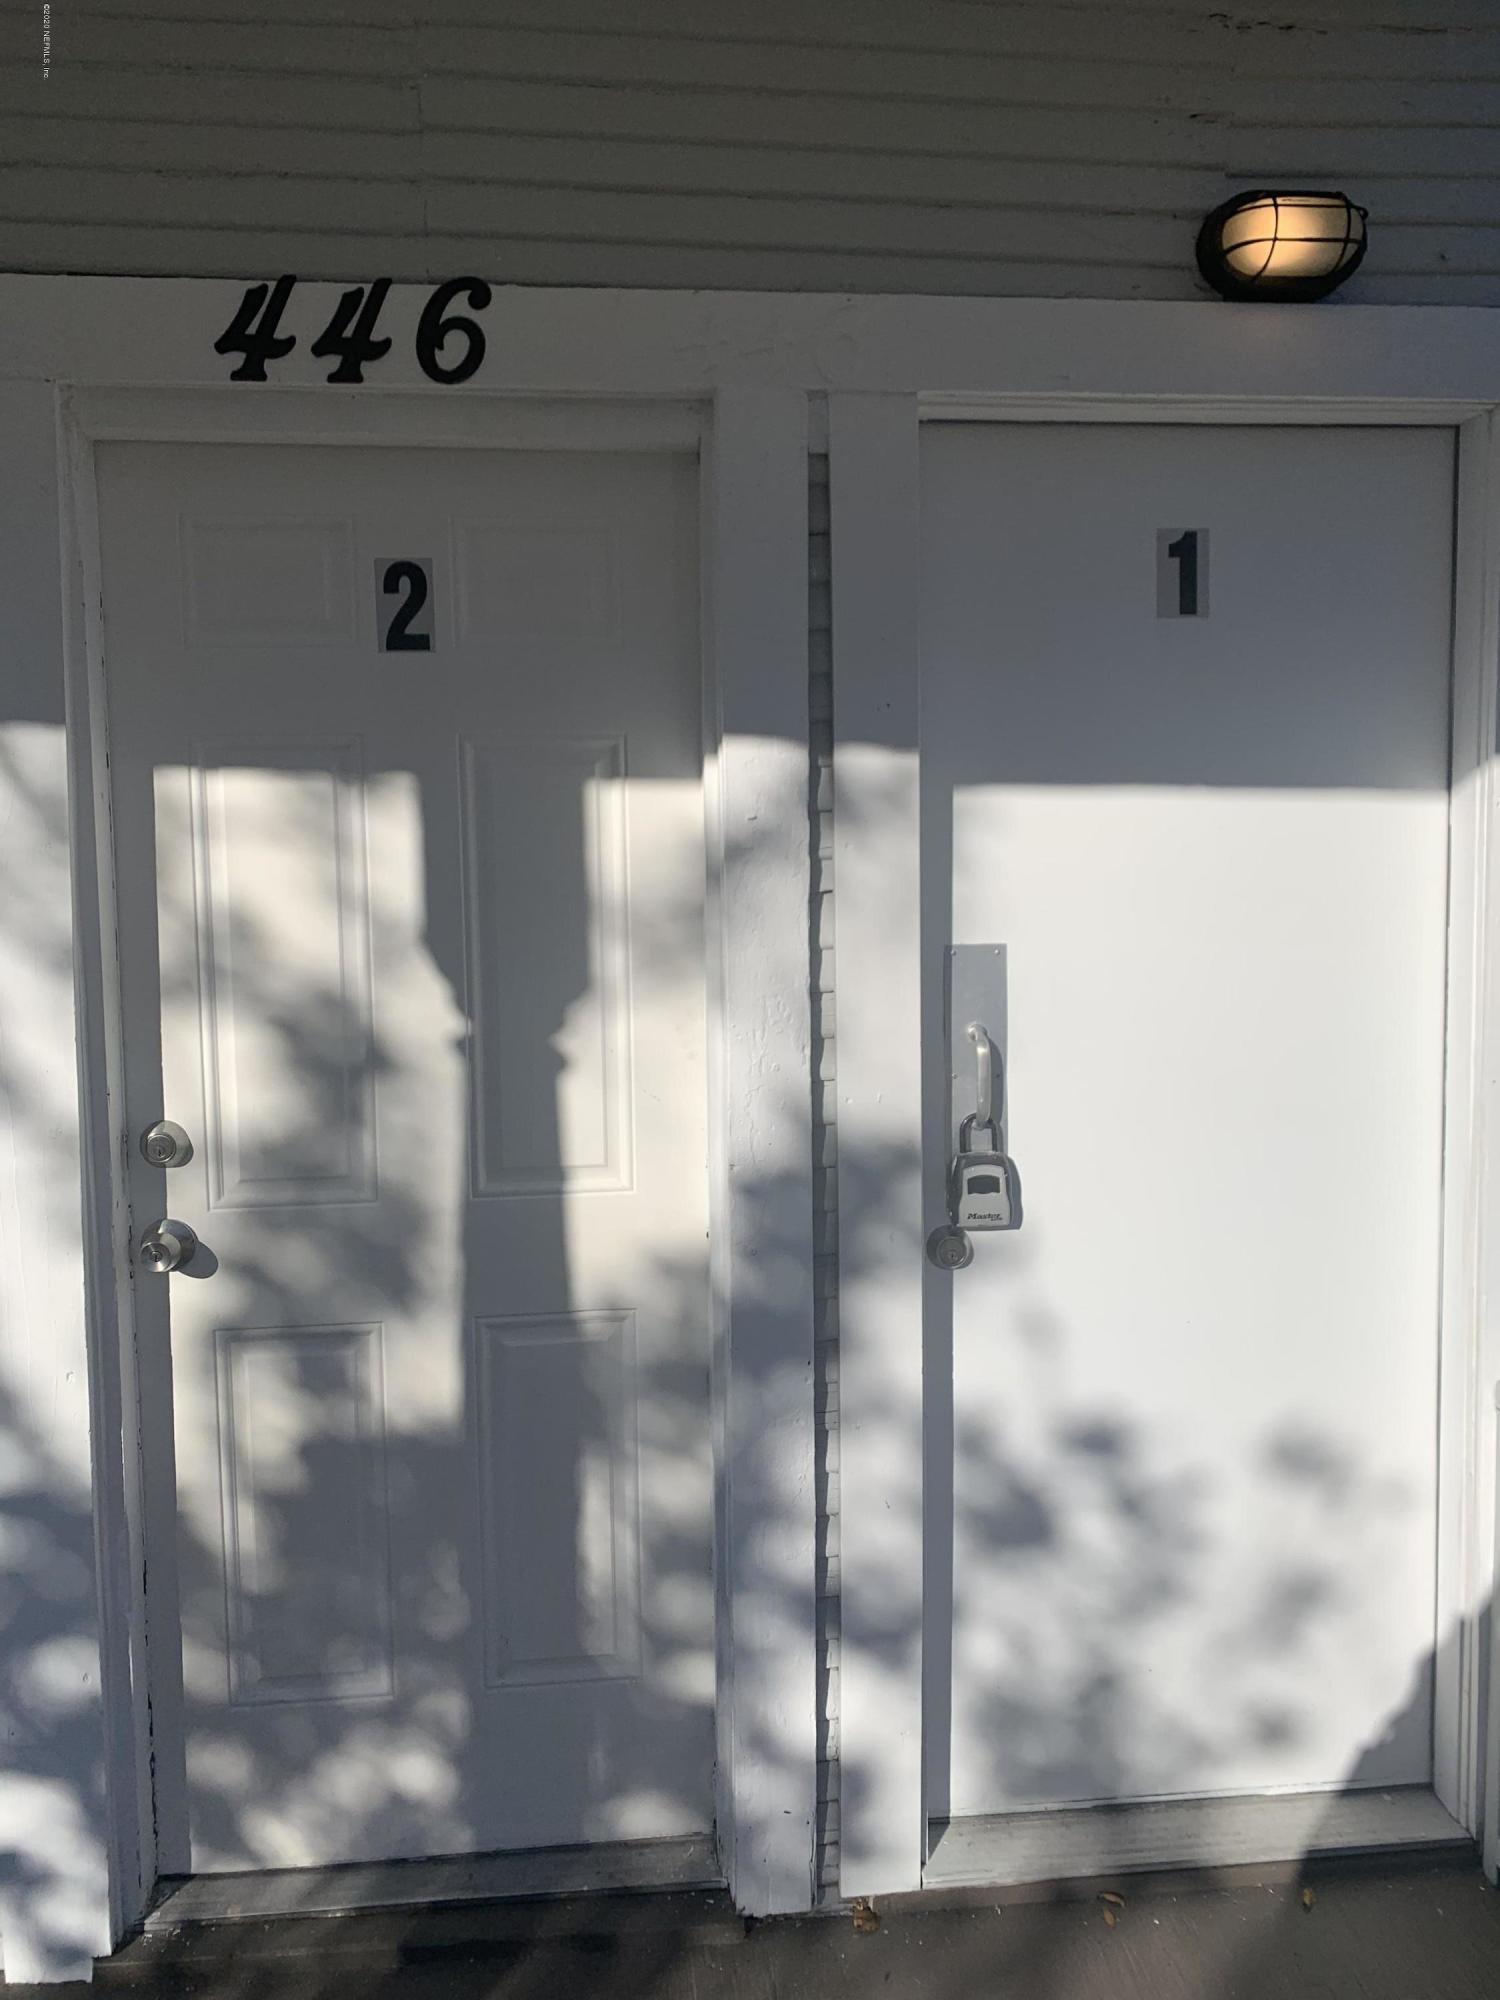 Image 5 of 52 For 446 Belfort St